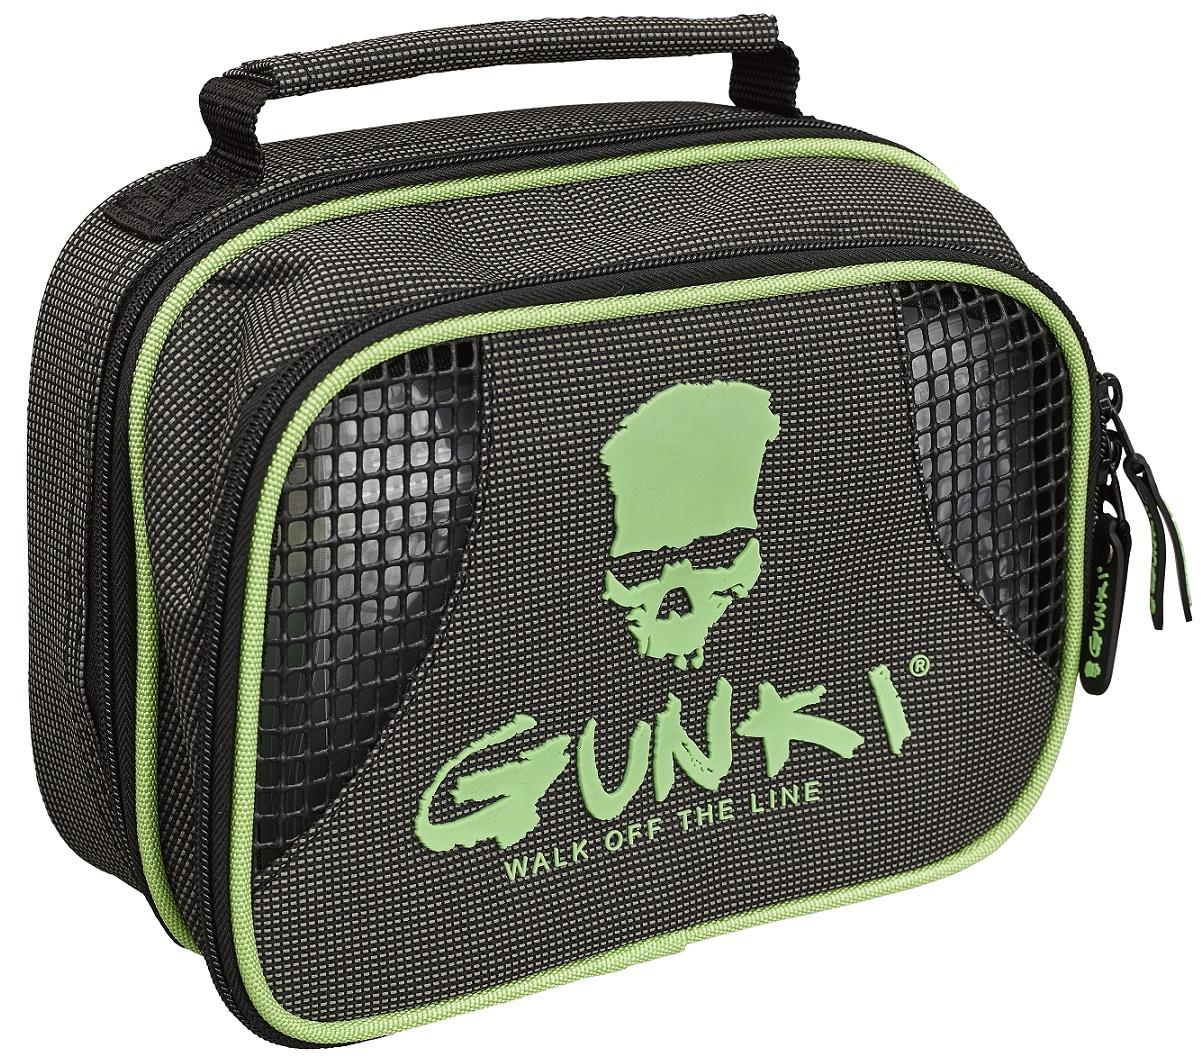 Iron-T Hand Bag PM (taška)